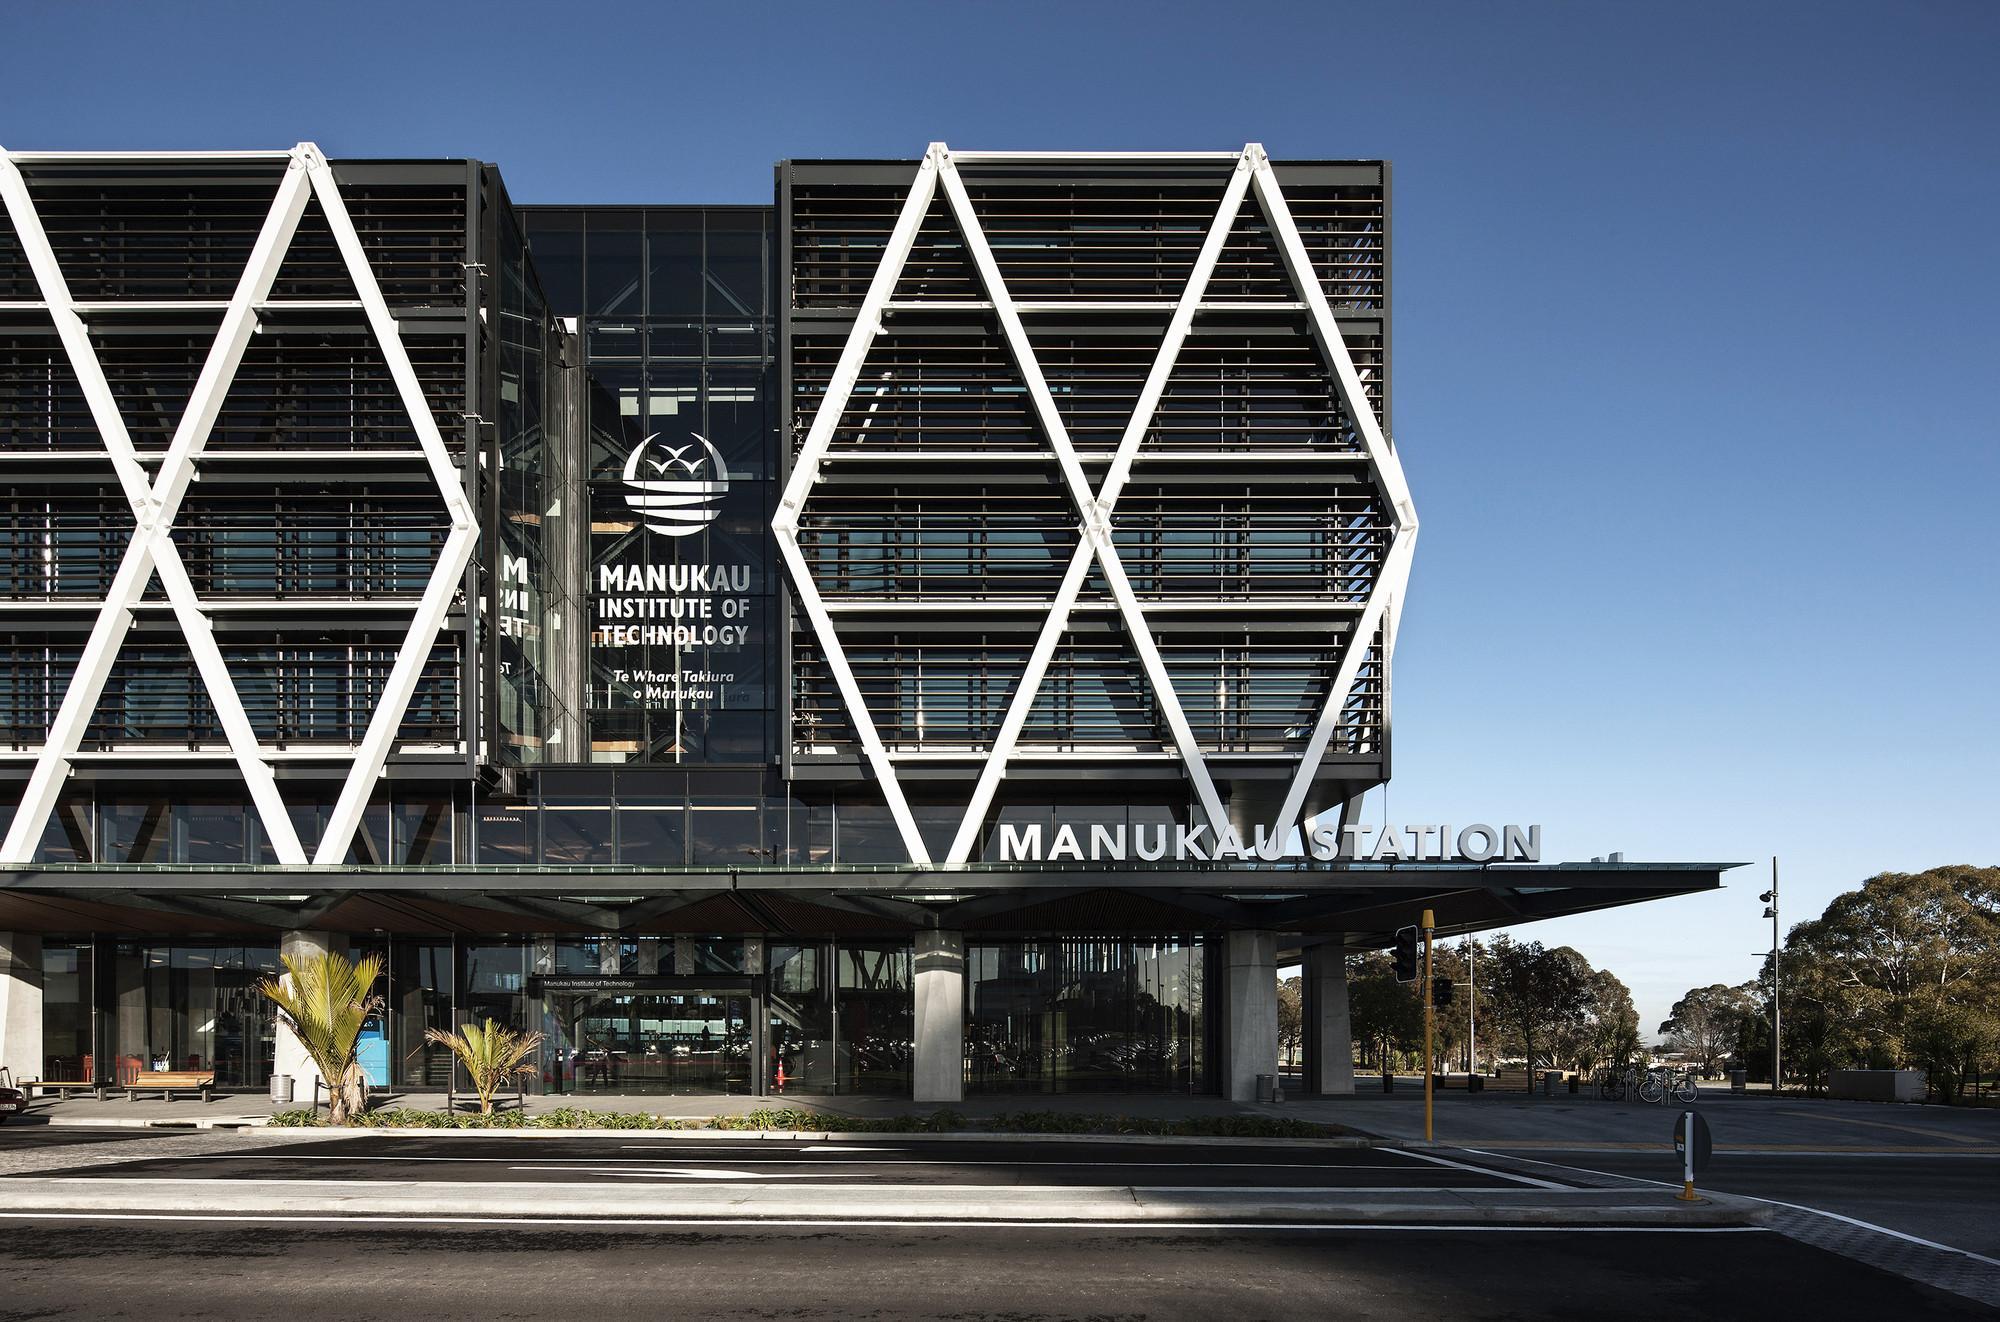 MANUKAU INSTITUTE OF TECHNOLOGY (MIT) – HỌC VIỆN CÔNG NGHỆ LOẠI 1 TẠI AUCKLAND, NEW ZEALAND.